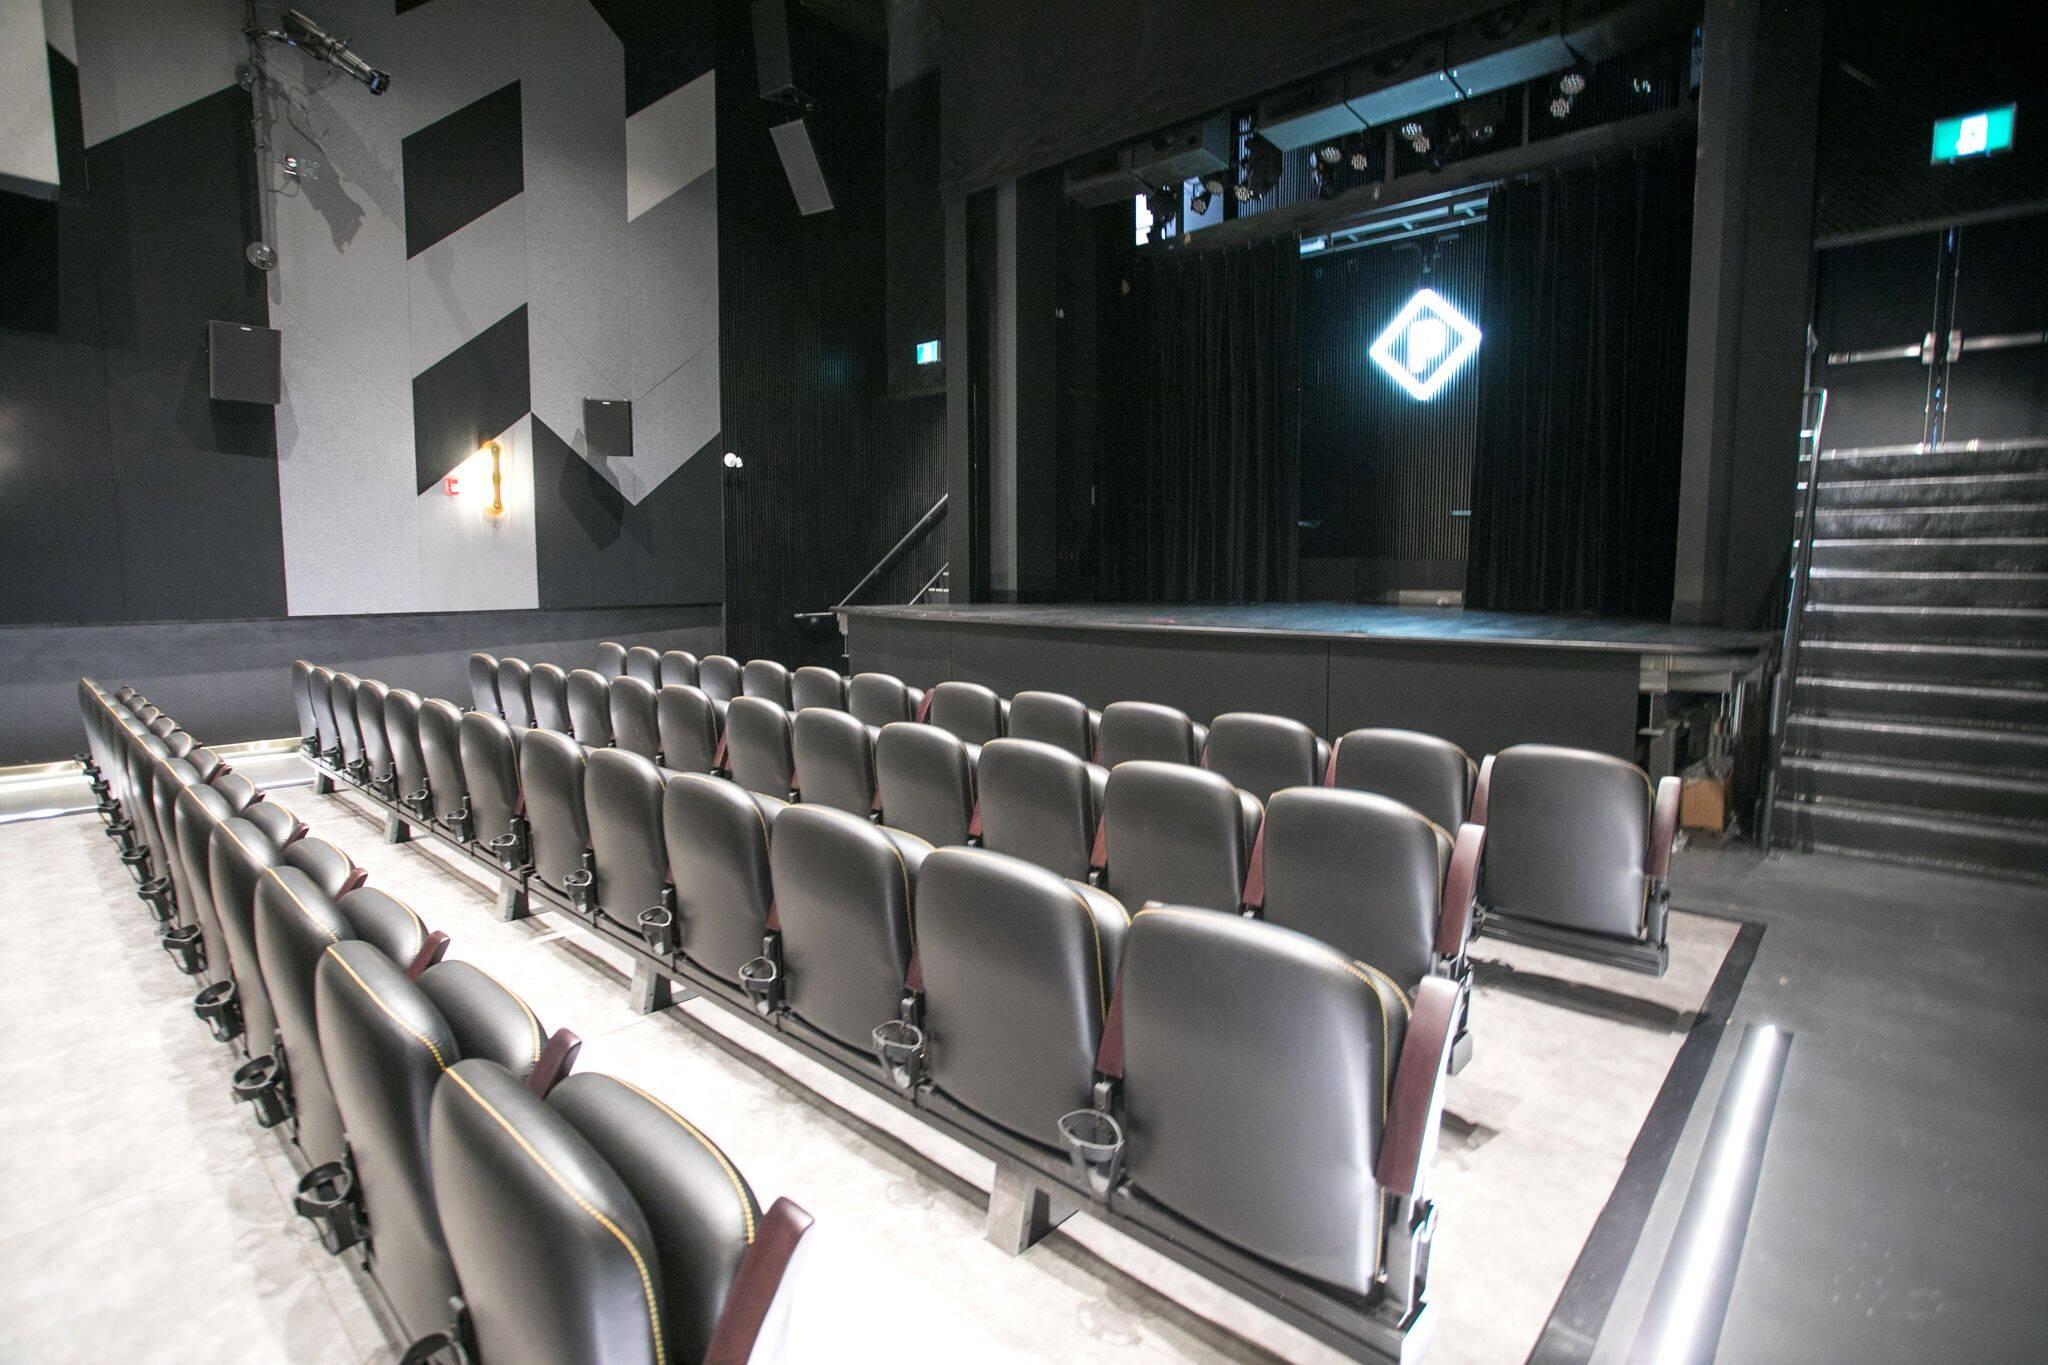 are movie theatres open in toronto